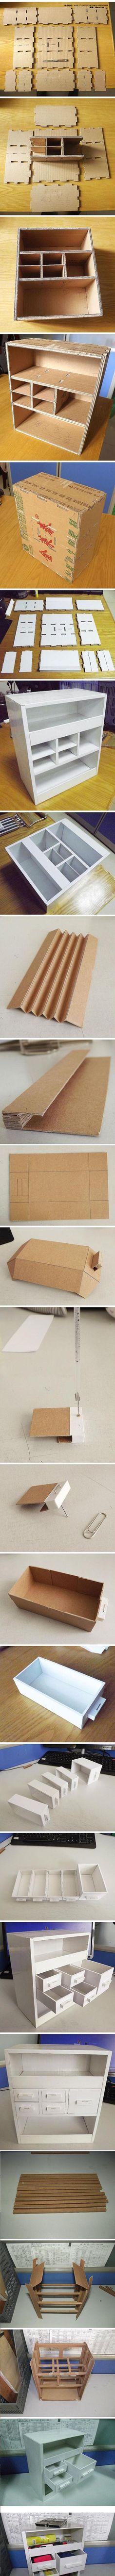 .Impressive, cardboard drawers